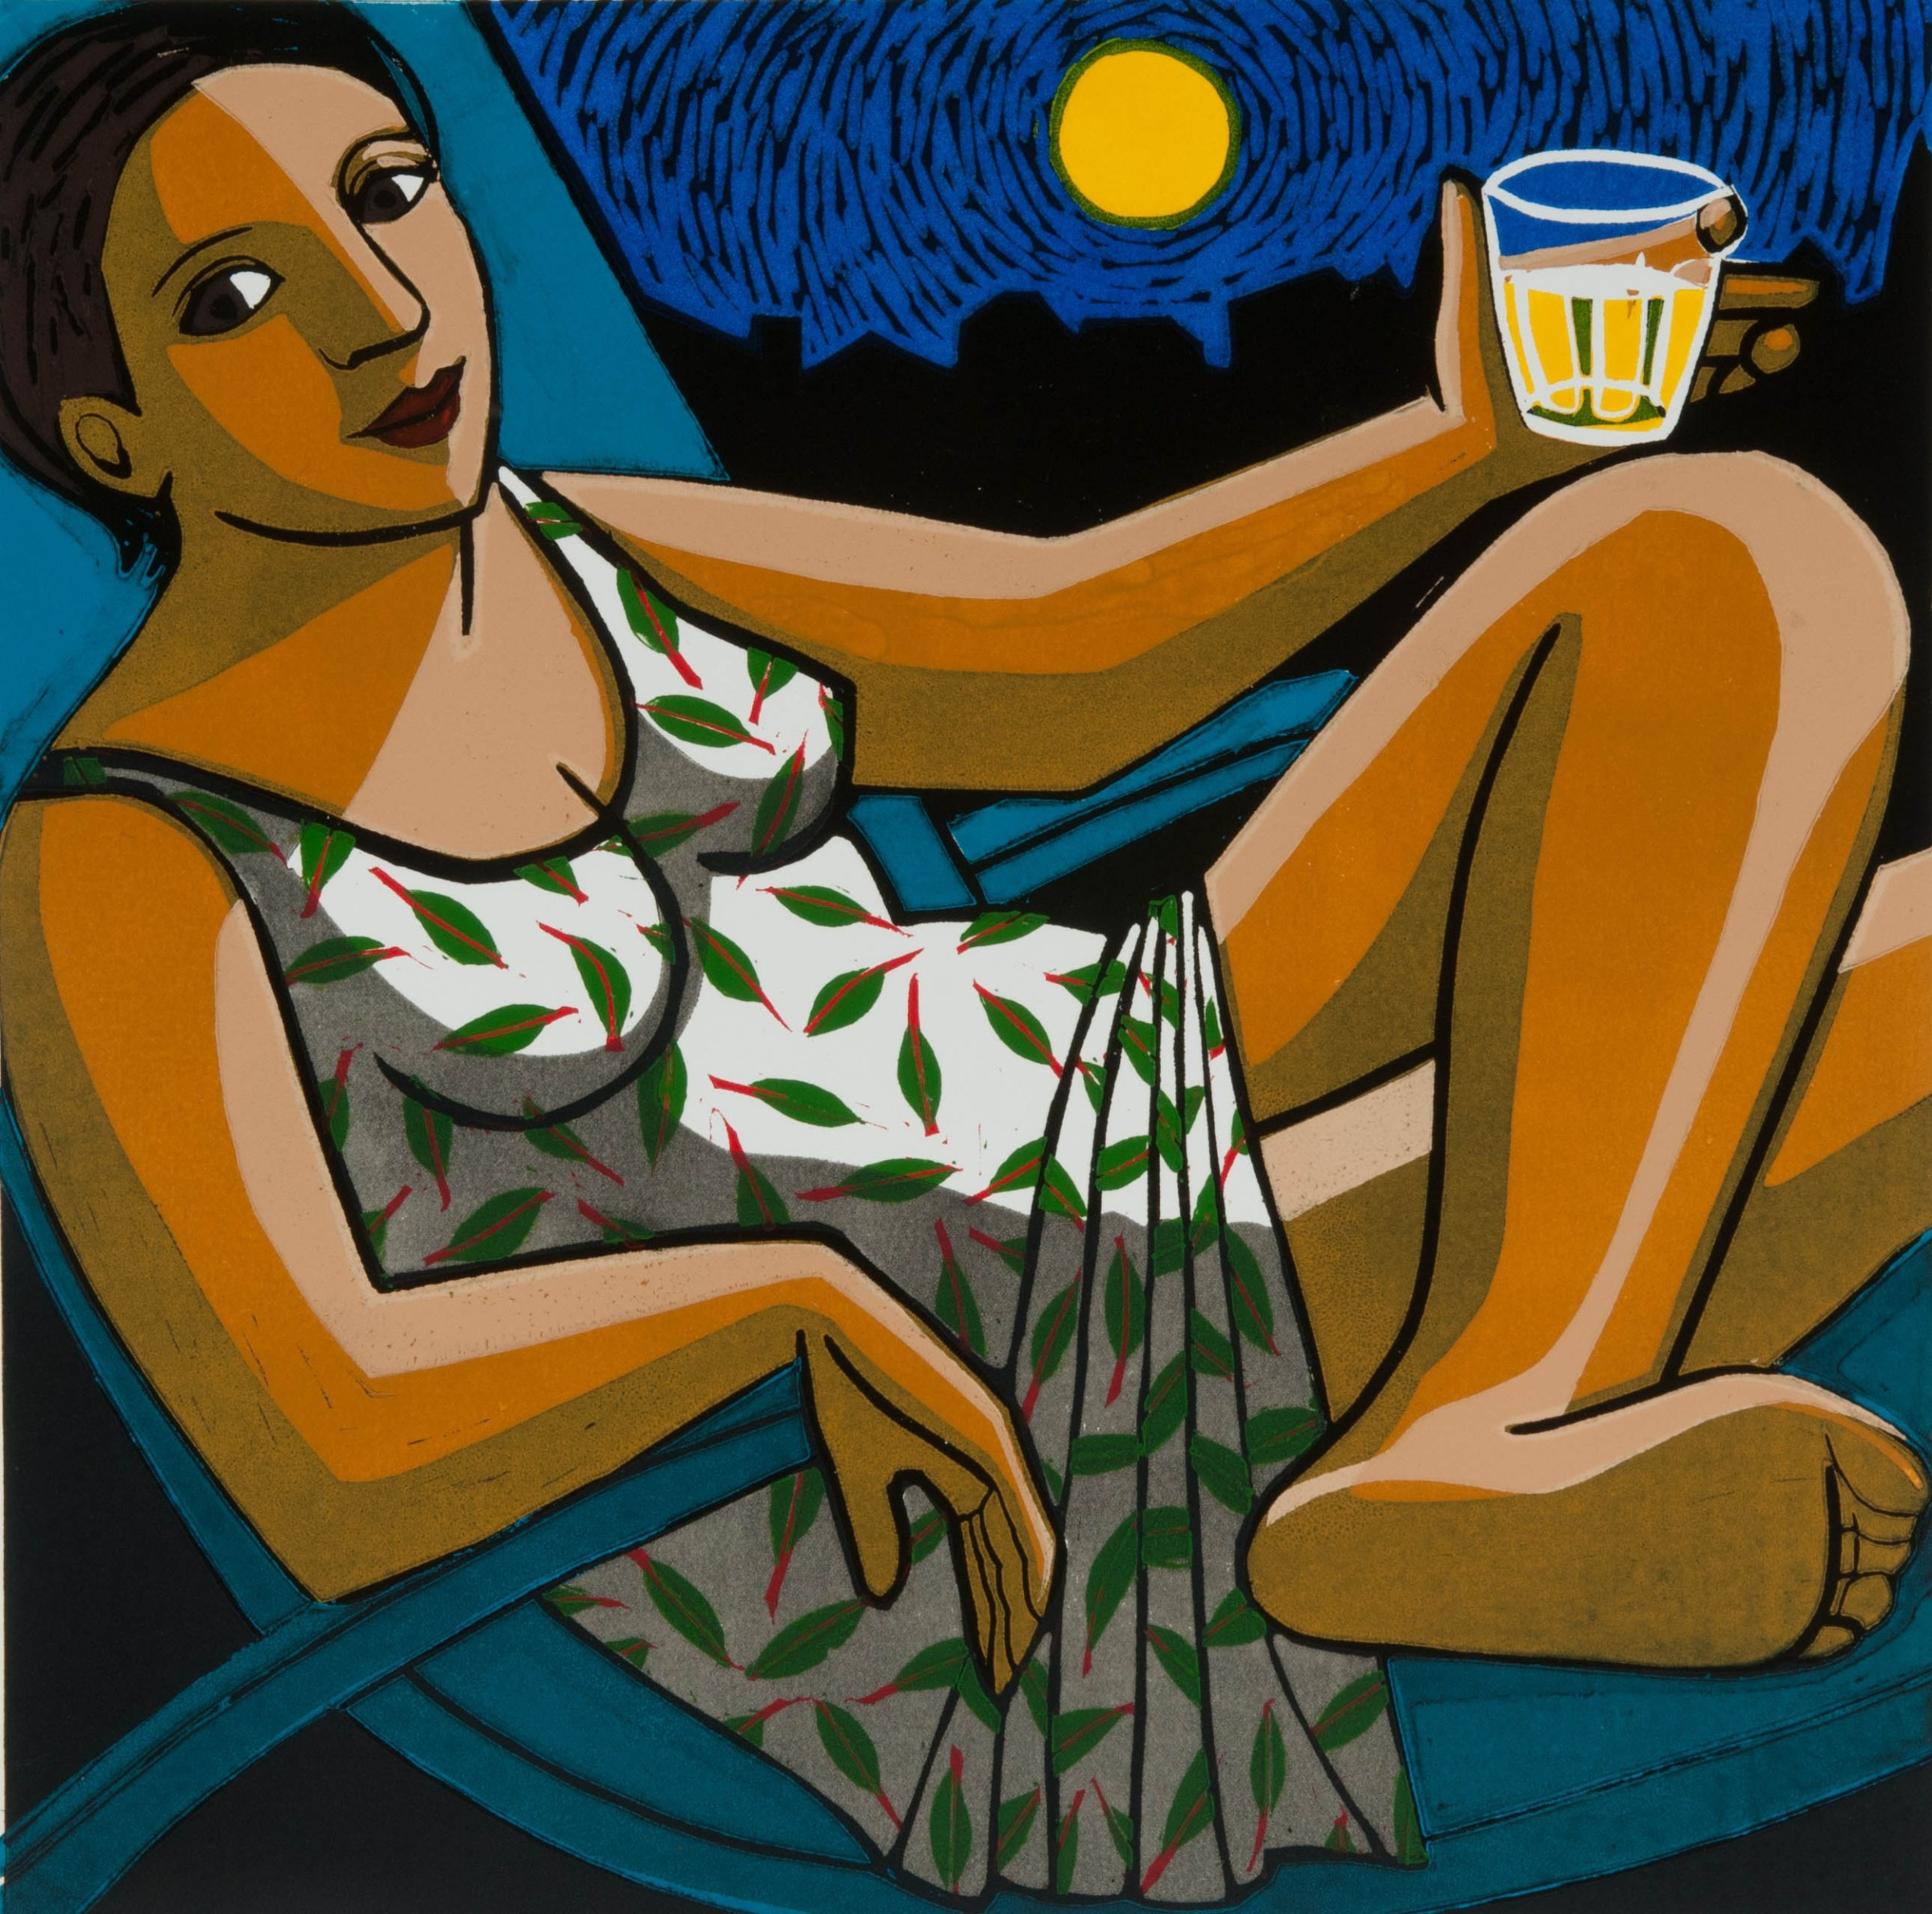 "<span class=""link fancybox-details-link""><a href=""/exhibitions/21/works/artworks_standalone10928/"">View Detail Page</a></span><div class=""artist""><span class=""artist""><strong>Anita Klein PPRE Hon RWS</strong></span></div><div class=""title""><em>Summer Moon</em></div><div class=""medium"">linocut</div><div class=""dimensions"">64 x 62cm framed<br>45 x 45cm image</div><div class=""edition_details"">edition of 50</div>"